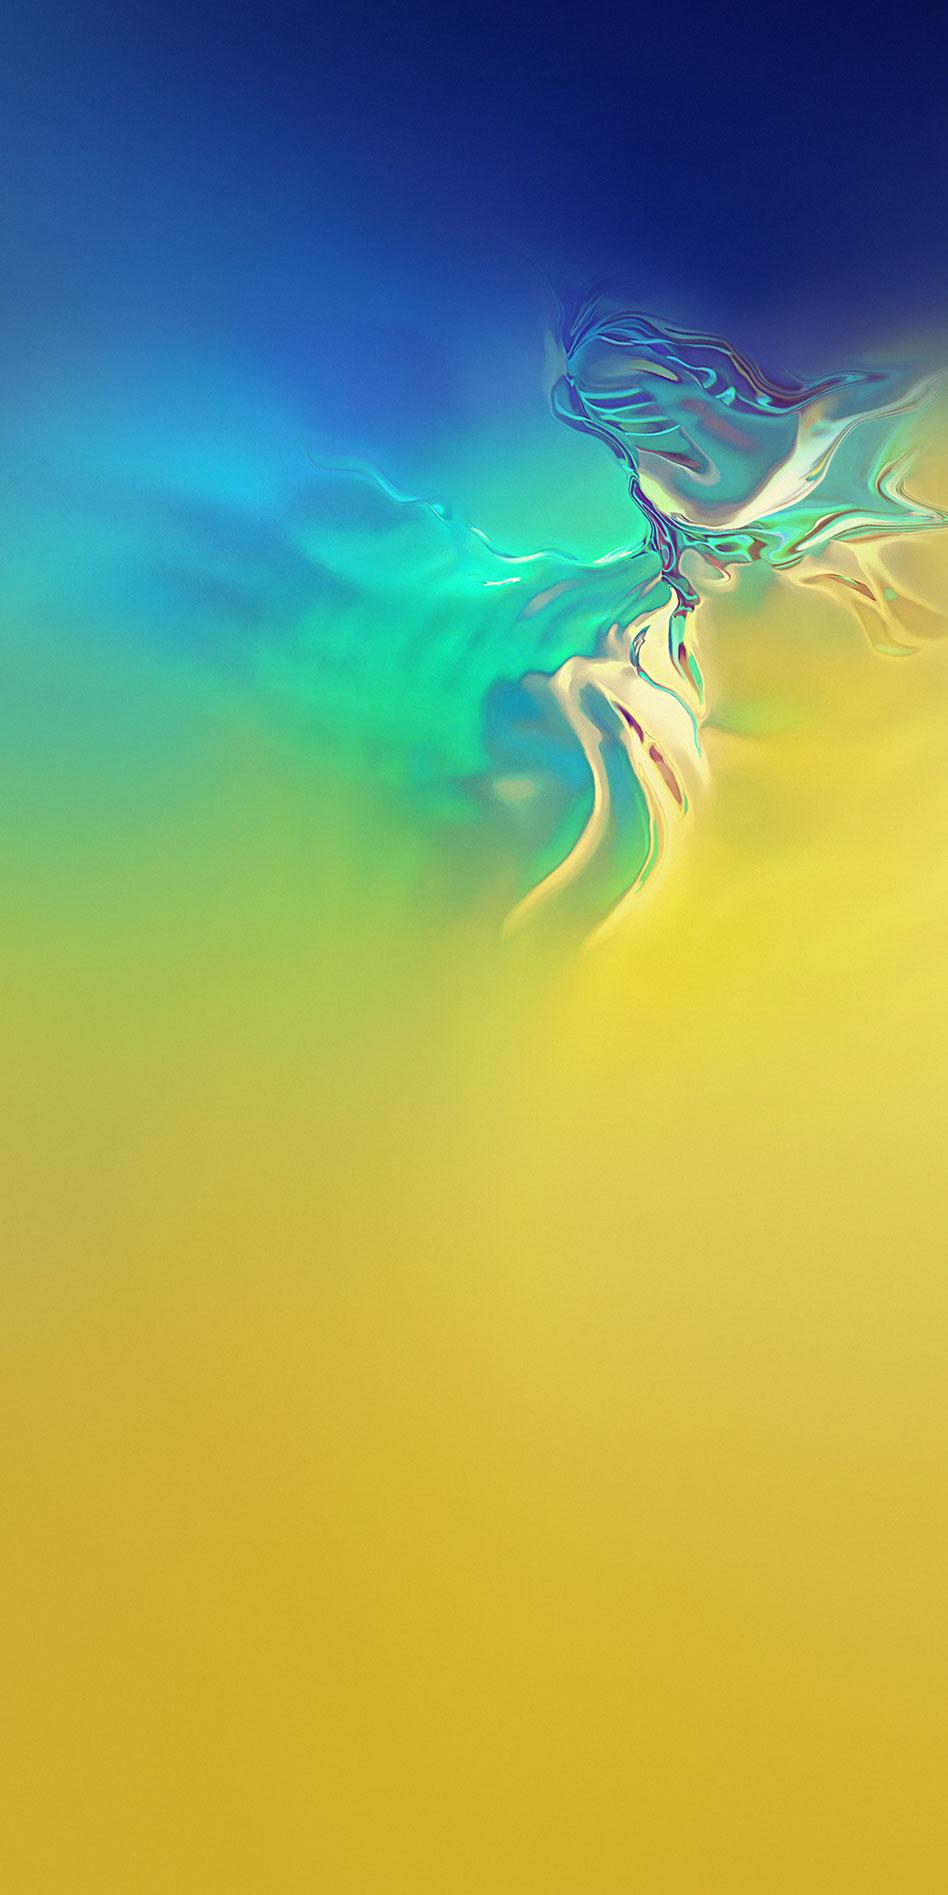 Best 12 Samsung Galaxy S10 Wallpaper Full Hd Download